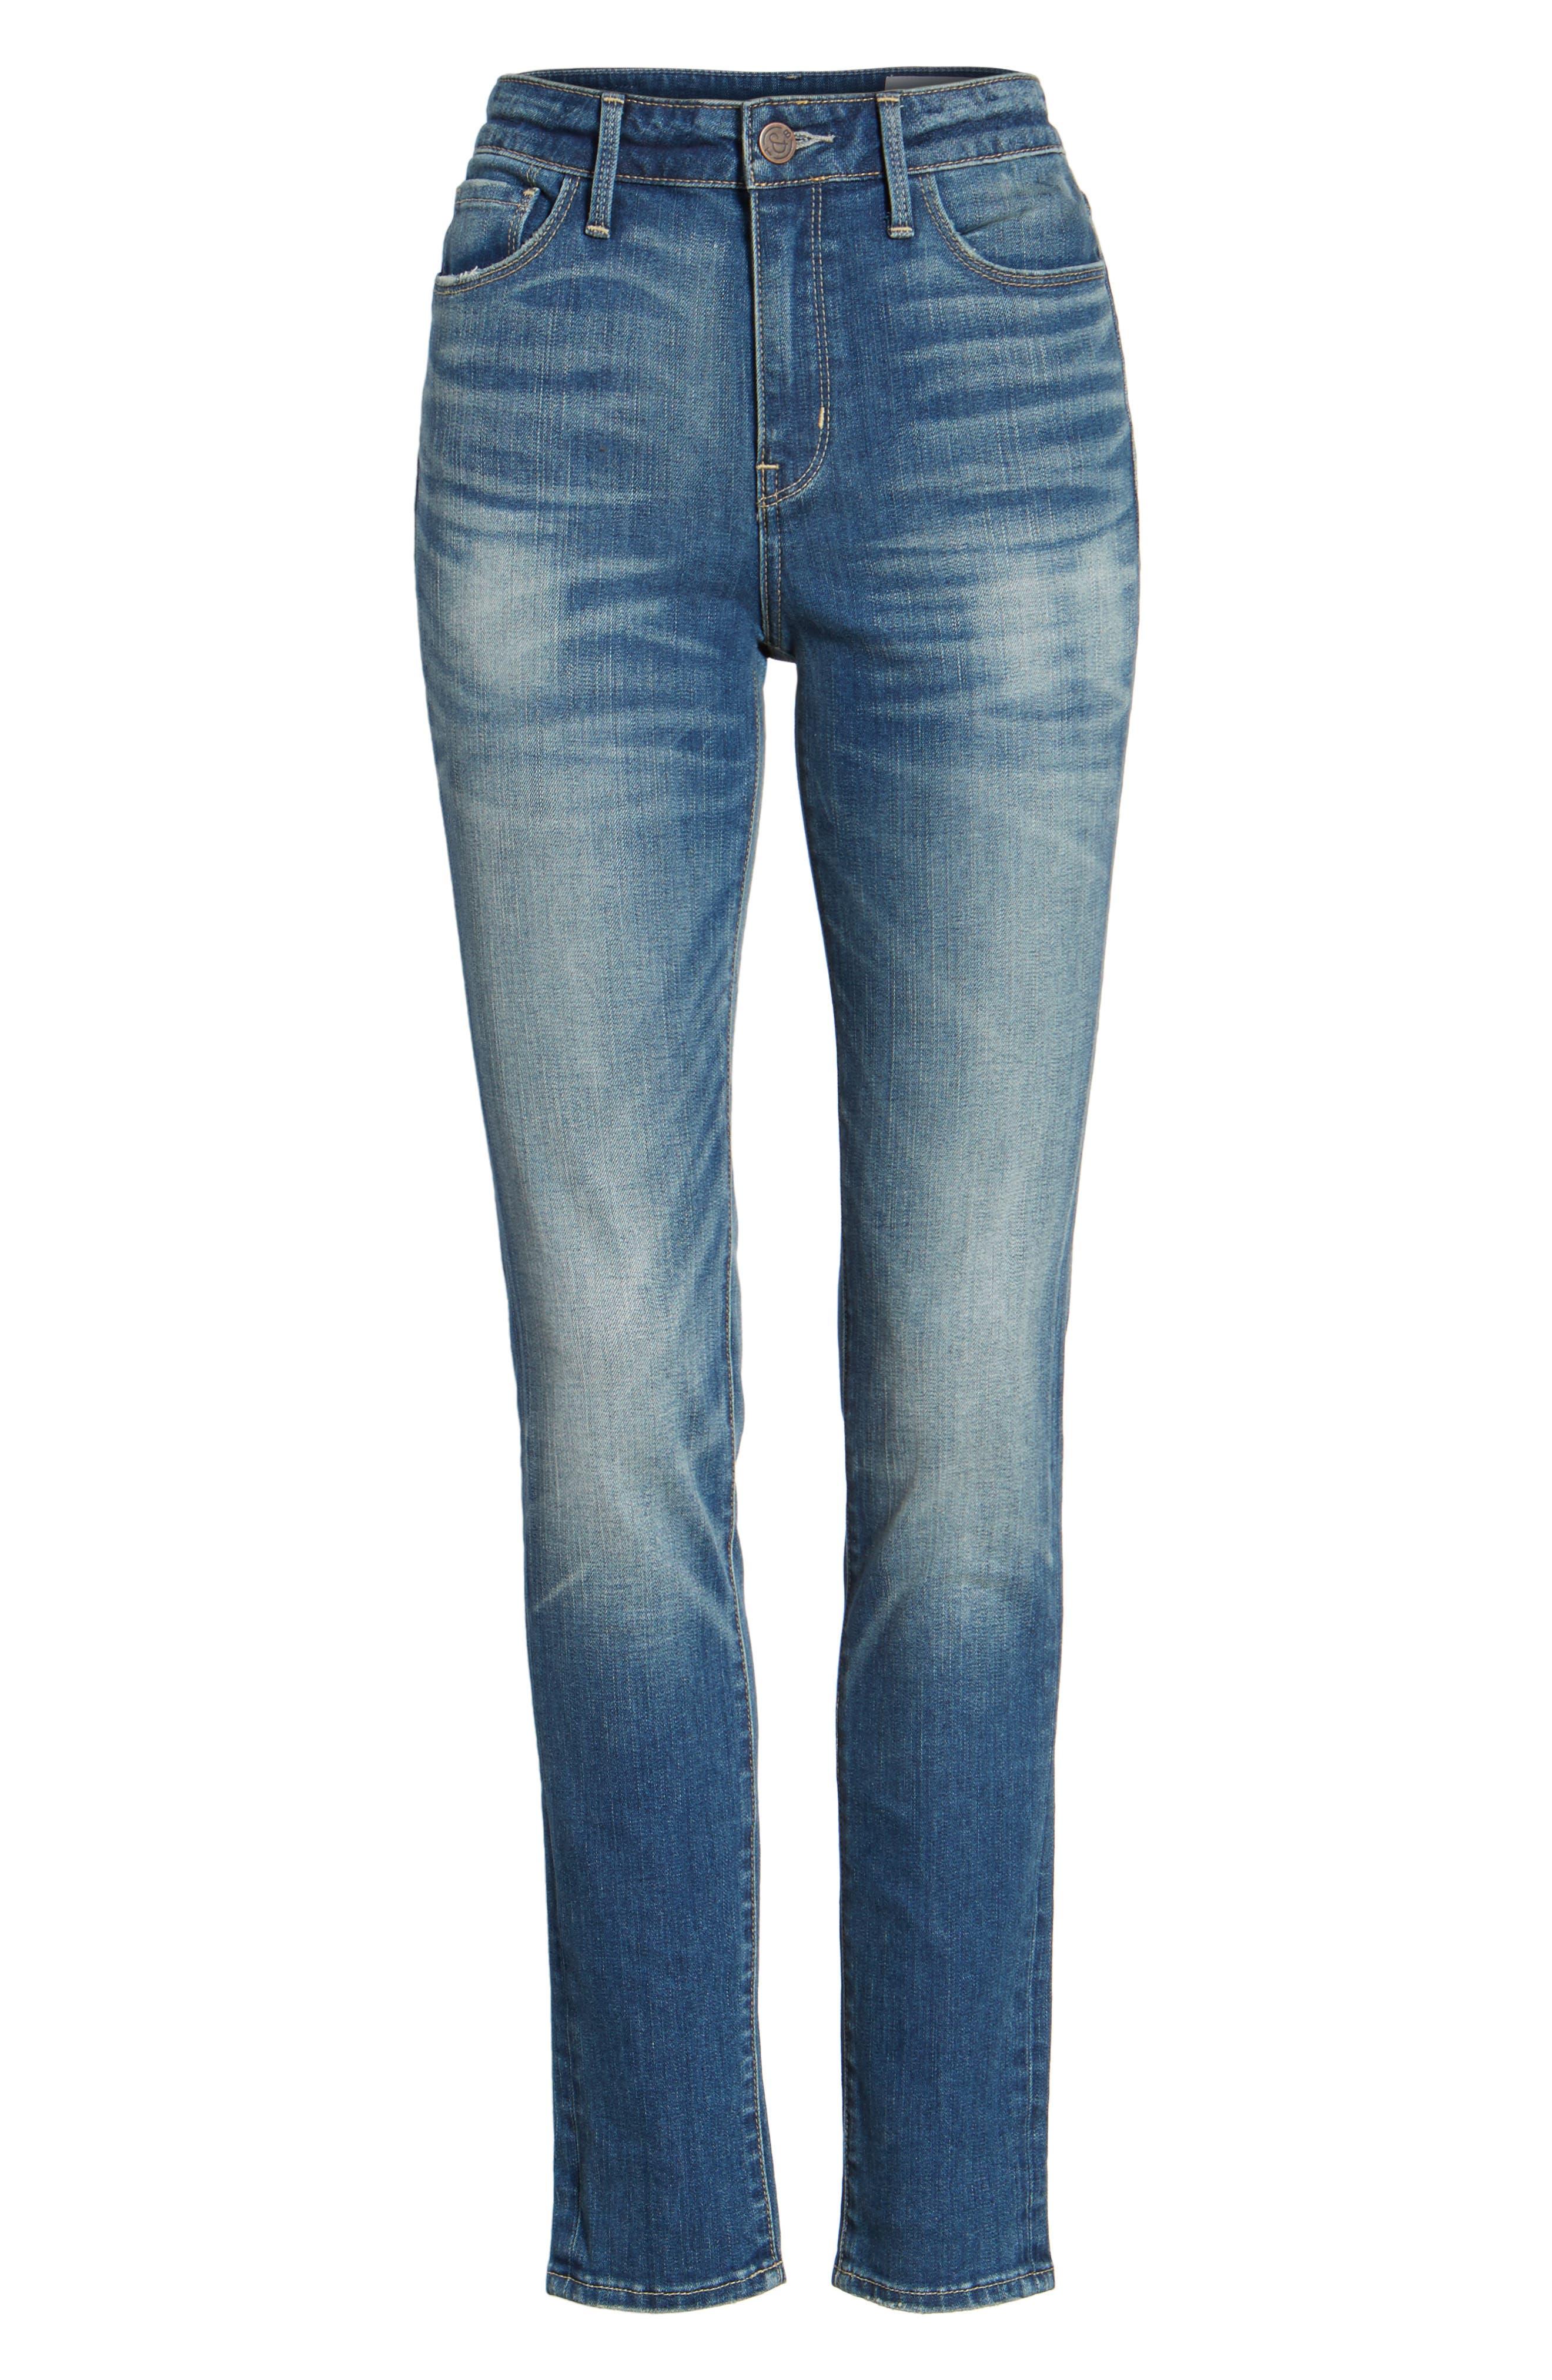 High Waist Skinny Jeans,                             Alternate thumbnail 8, color,                             Rain Medium Worn